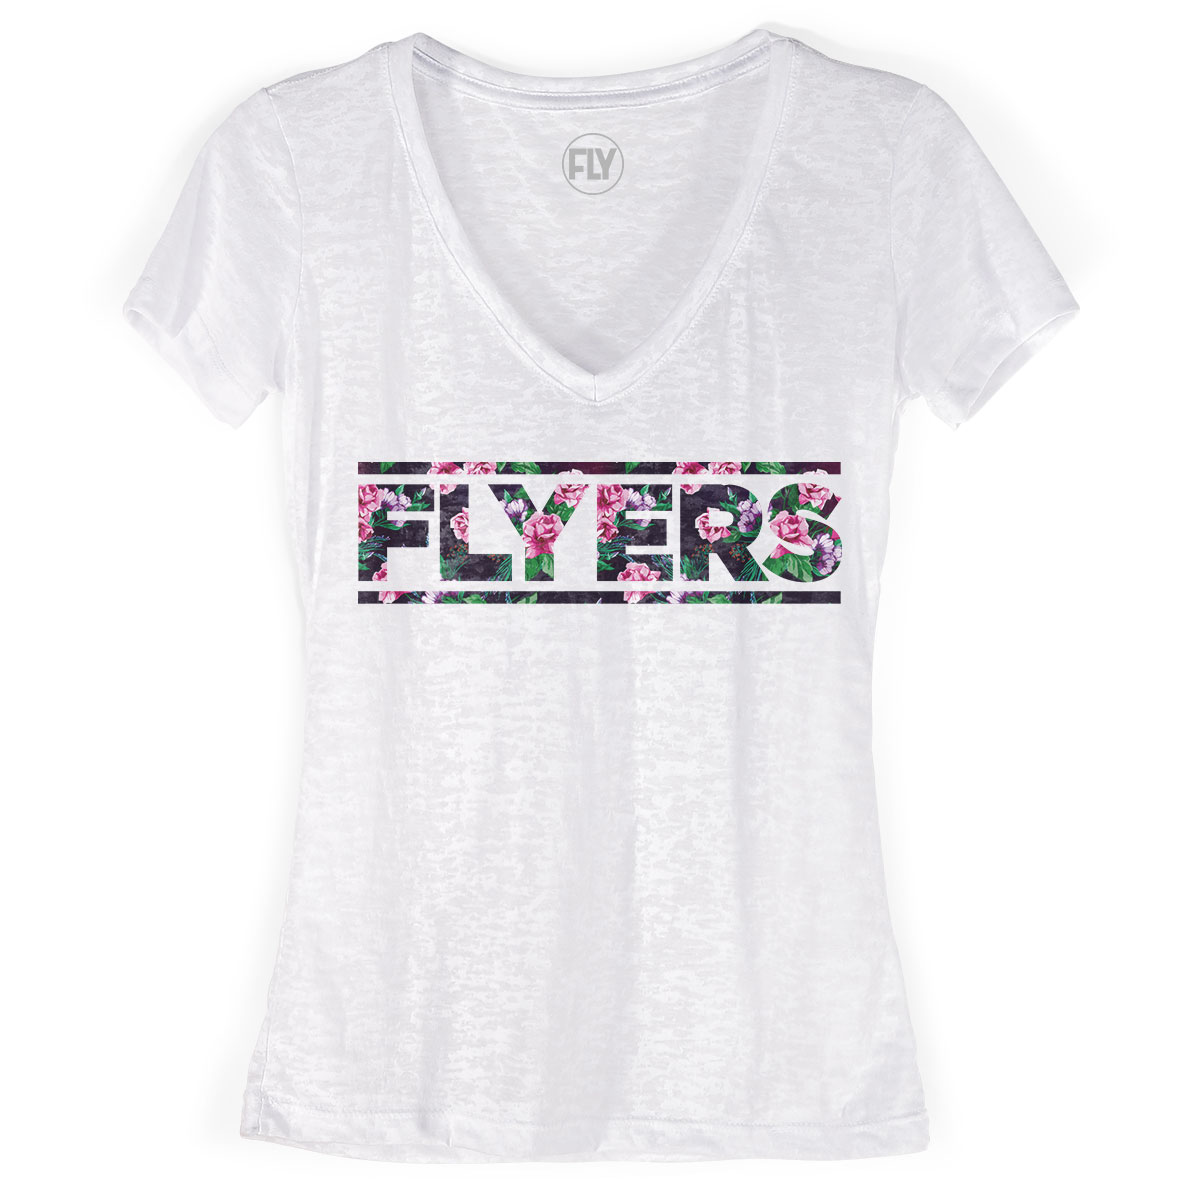 Camiseta Devorê Feminina Banda Fly Flyers